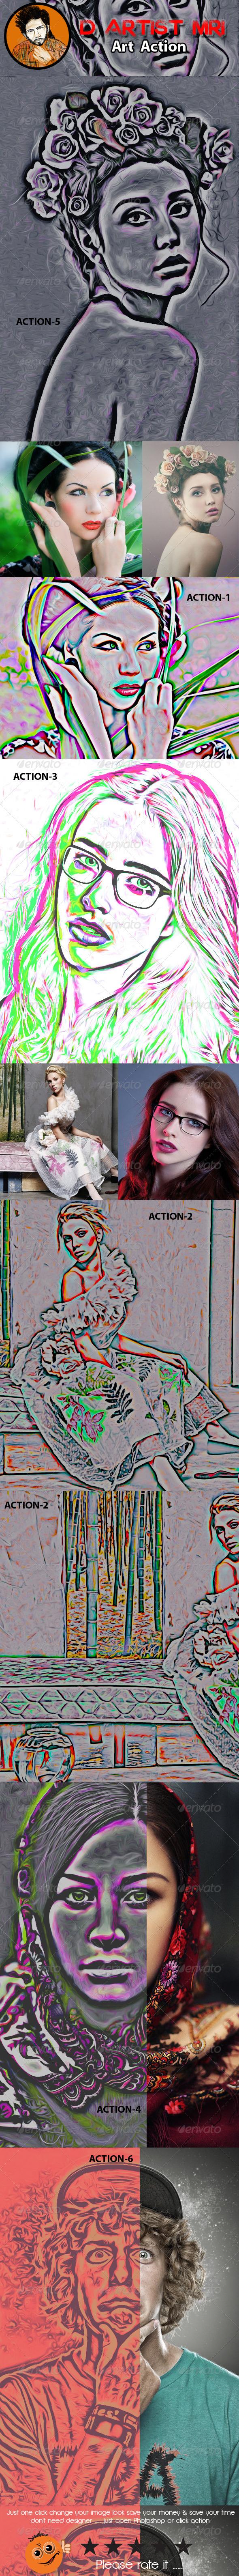 GraphicRiver Art Action 8744904